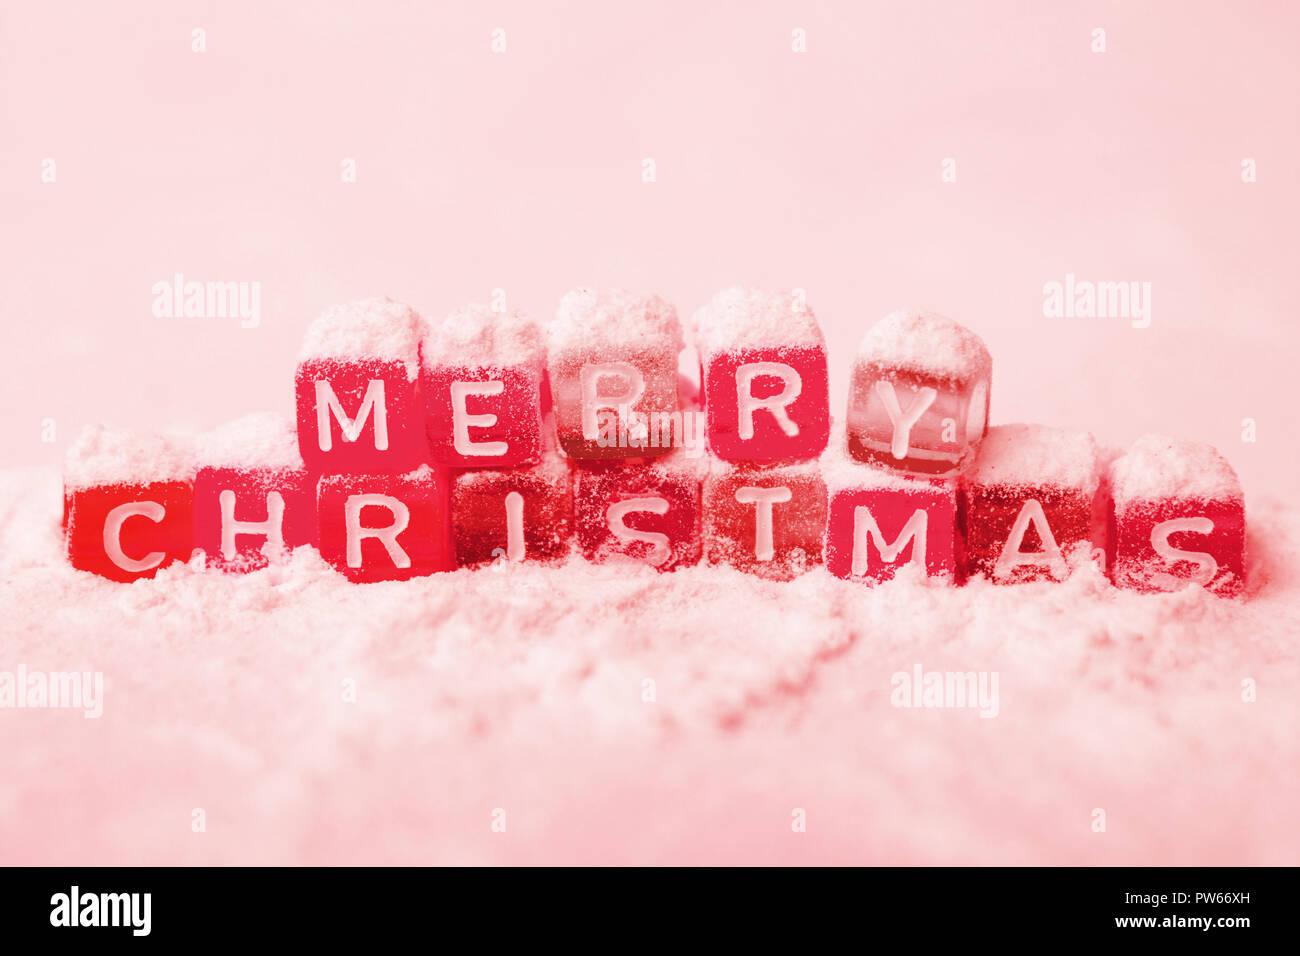 Merry Christmas And Happy New Yea Stock Photos & Merry